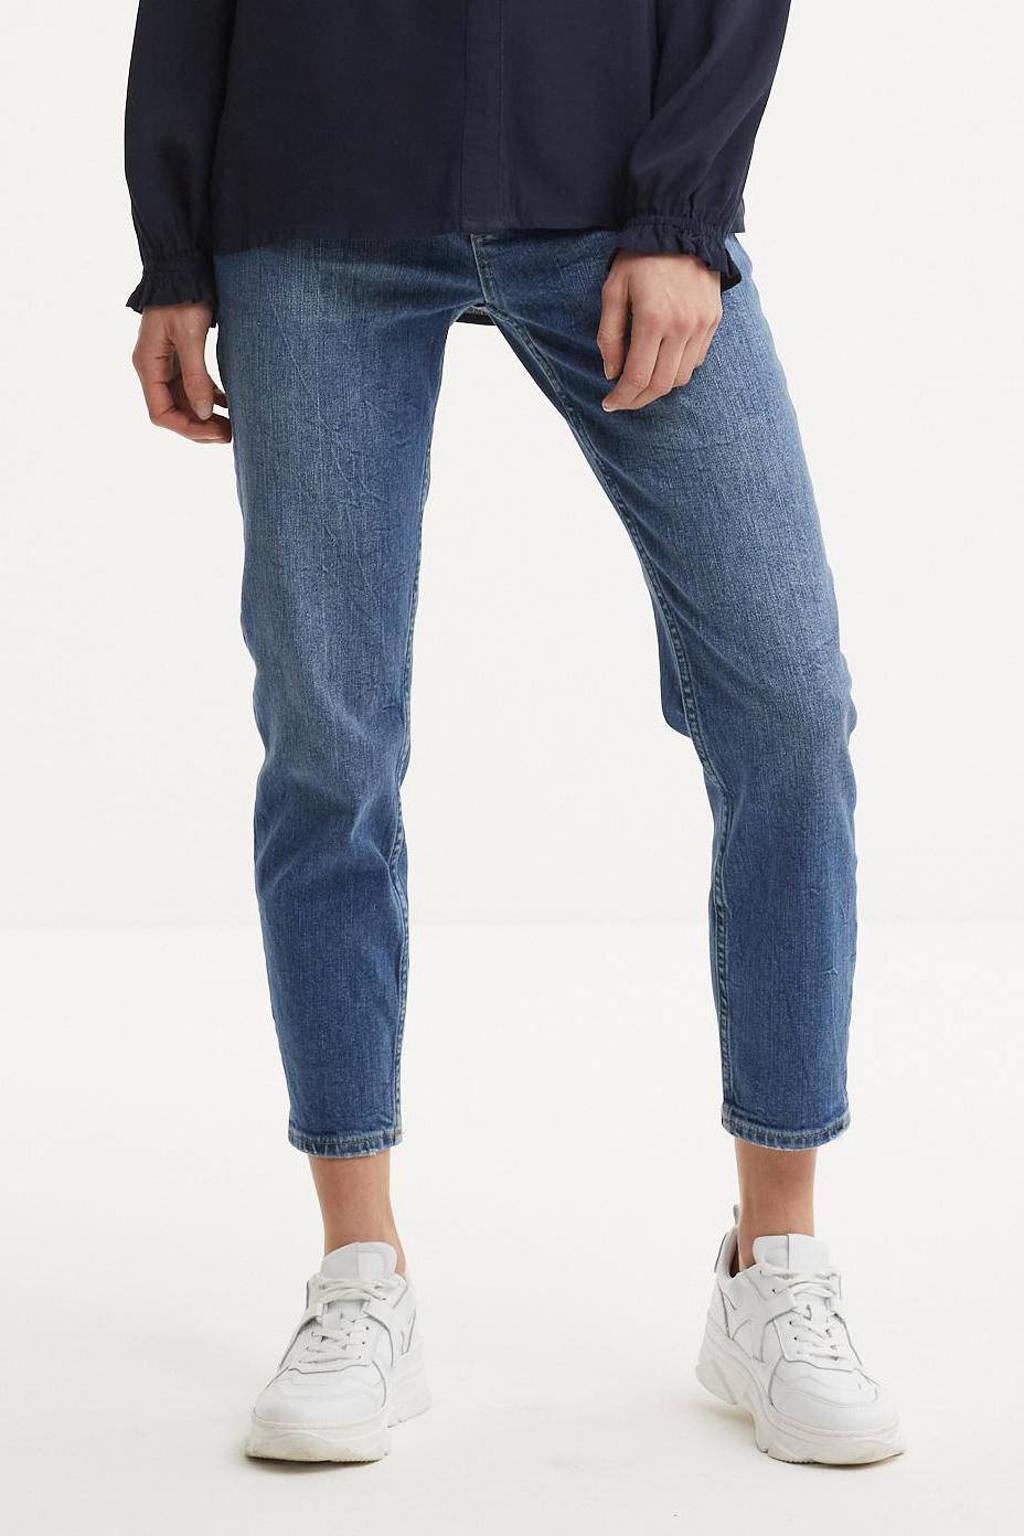 C&A The Denim high waist straight fit jeans light denim, Light denim